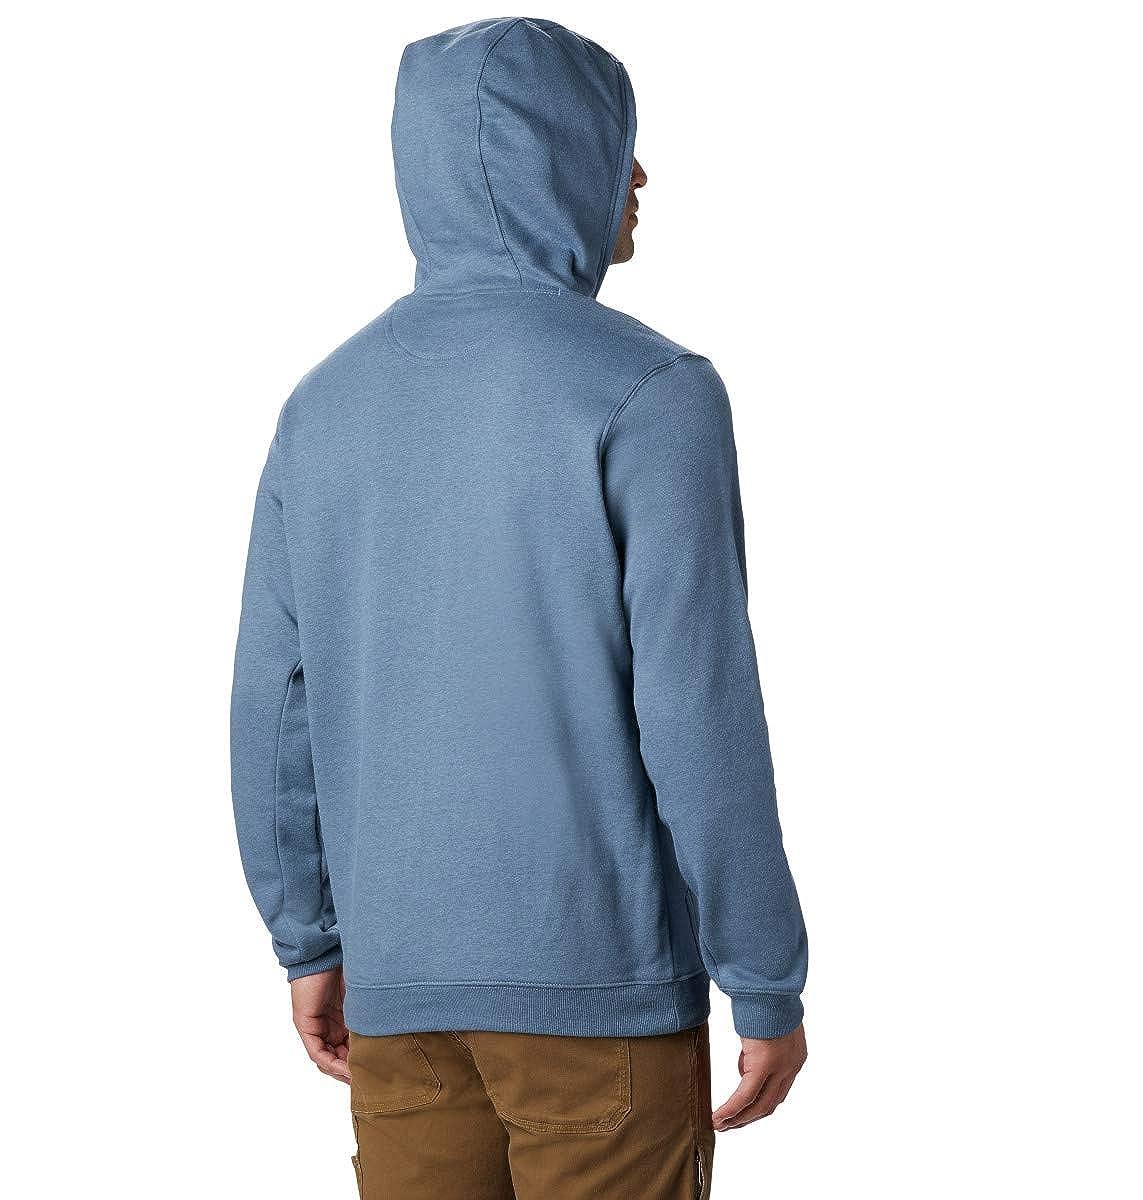 Cotton Blend Columbia Men/'s Hart Mountain Full Zip Hoodie